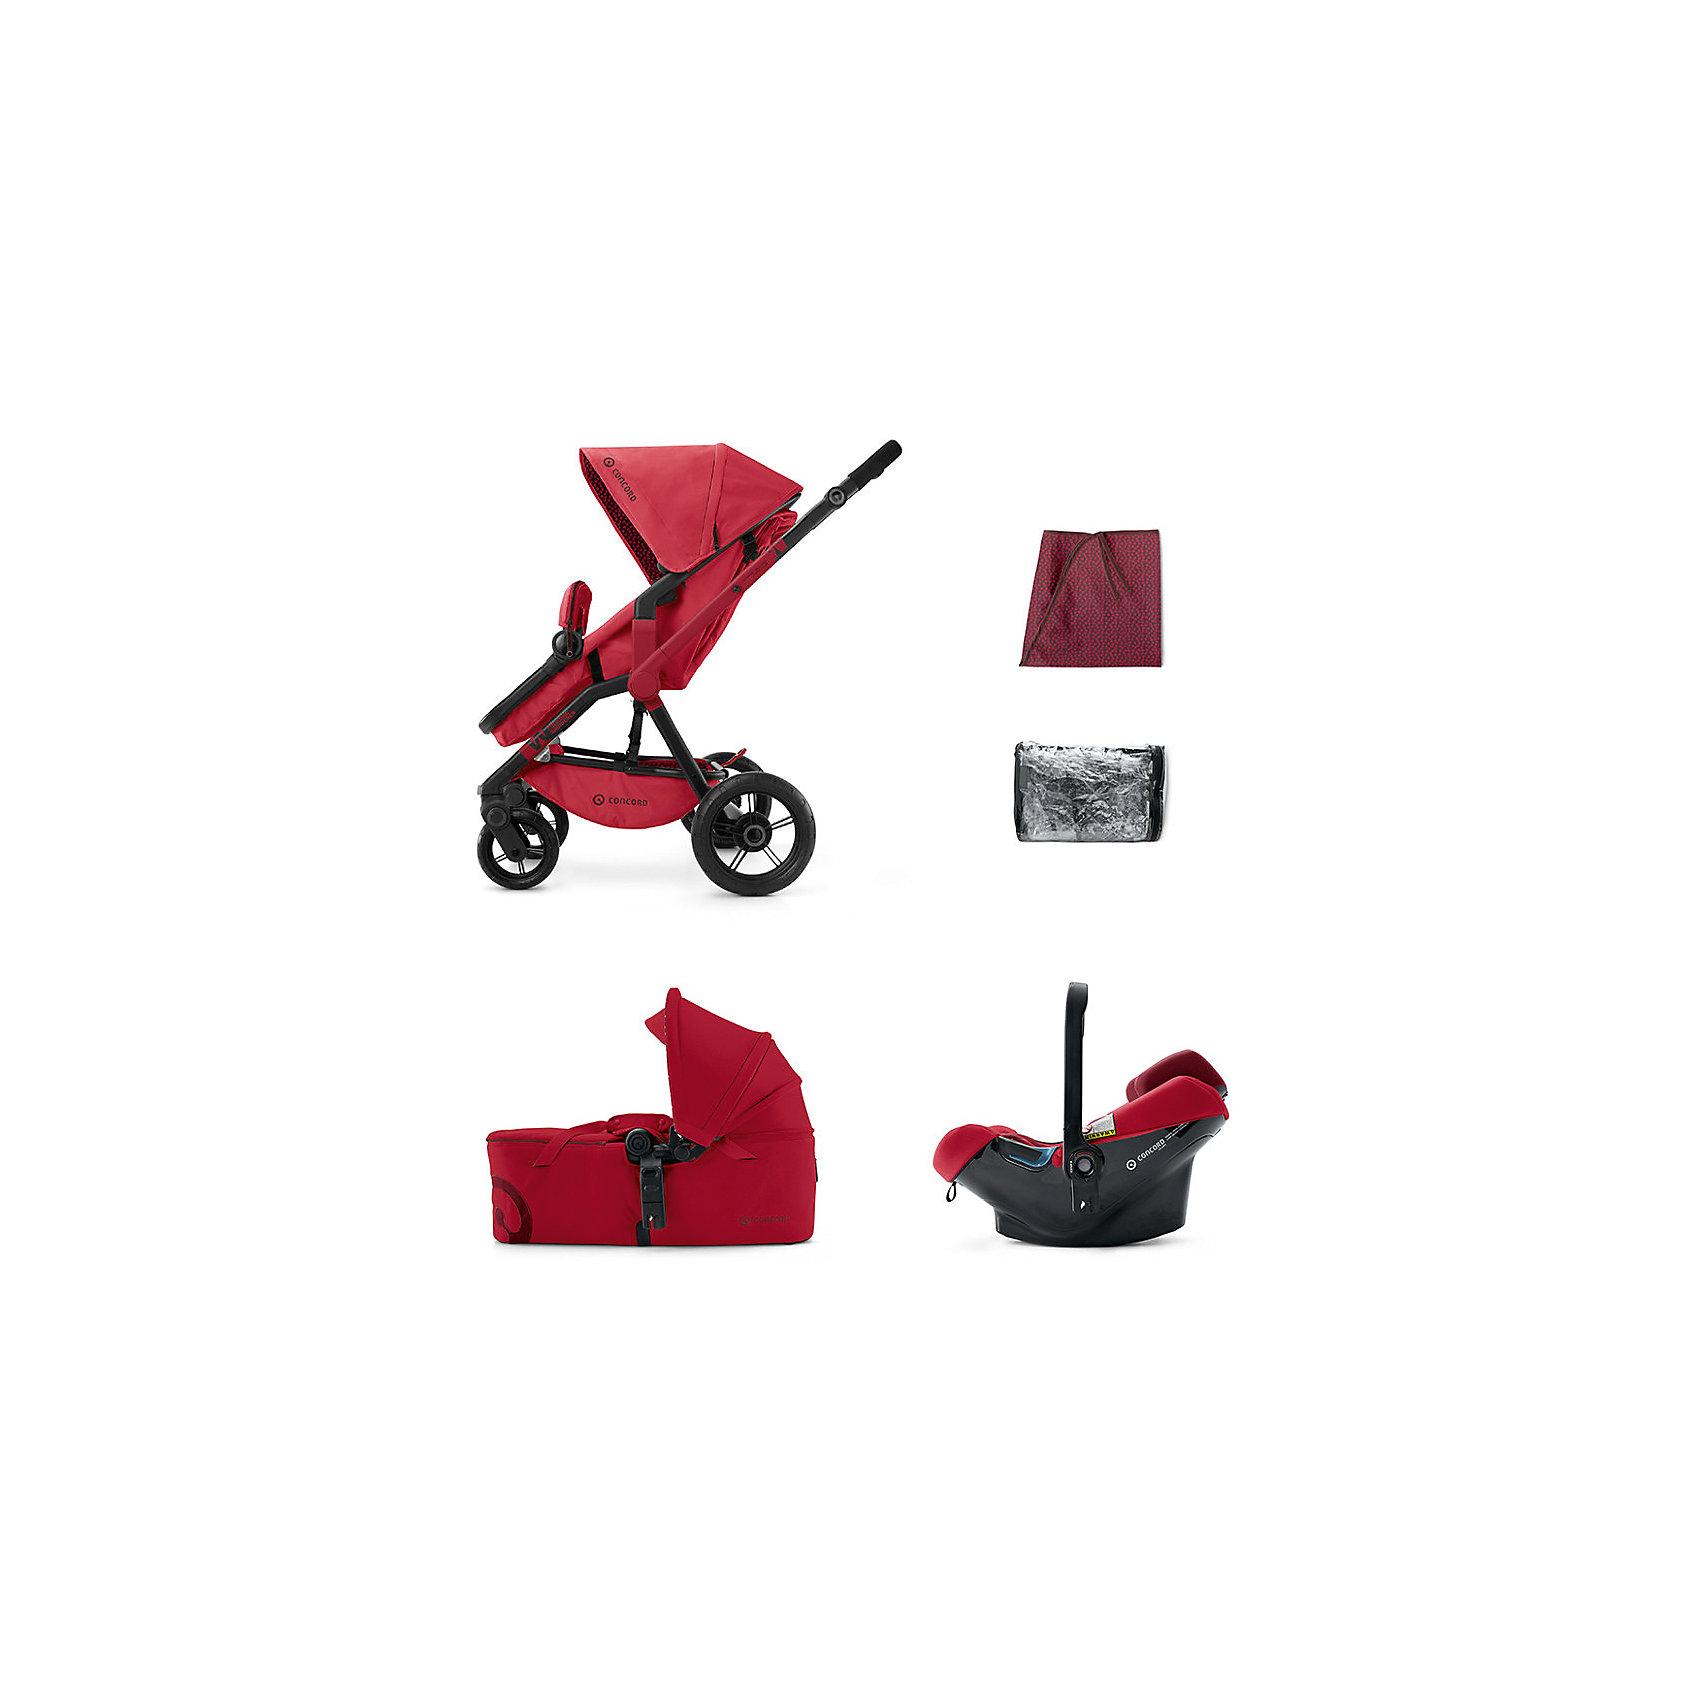 Одежда Бренды myToys.de Shop myToys.ru Для малышей Бренды Concord: Concord Коляска 3 в 1 Wanderer Mobility Set, Concord, Ruby Red 2015 Коляска 3 в 1 Wanderer Mobility Set, Concord, Ruby Red 2015